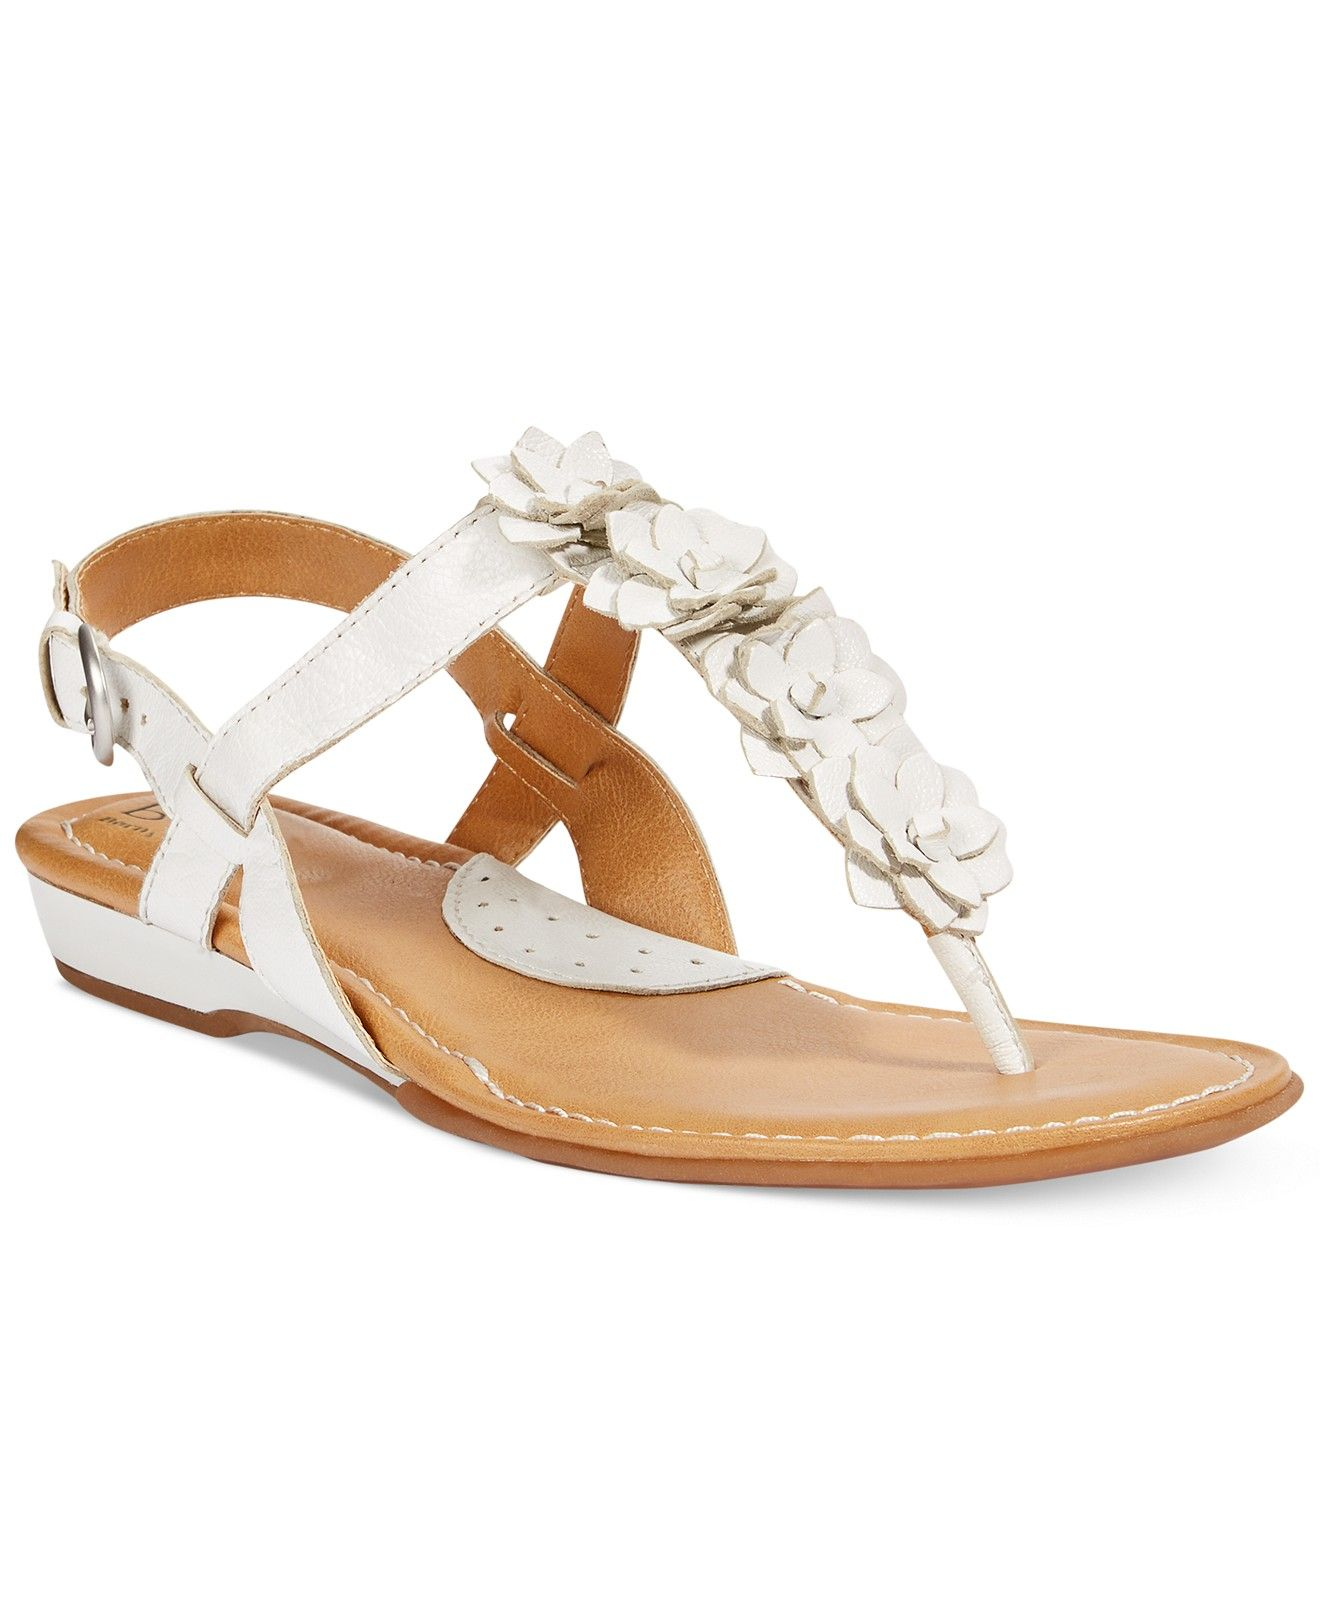 b.o.c Sonoran Flat Sandals - Sale